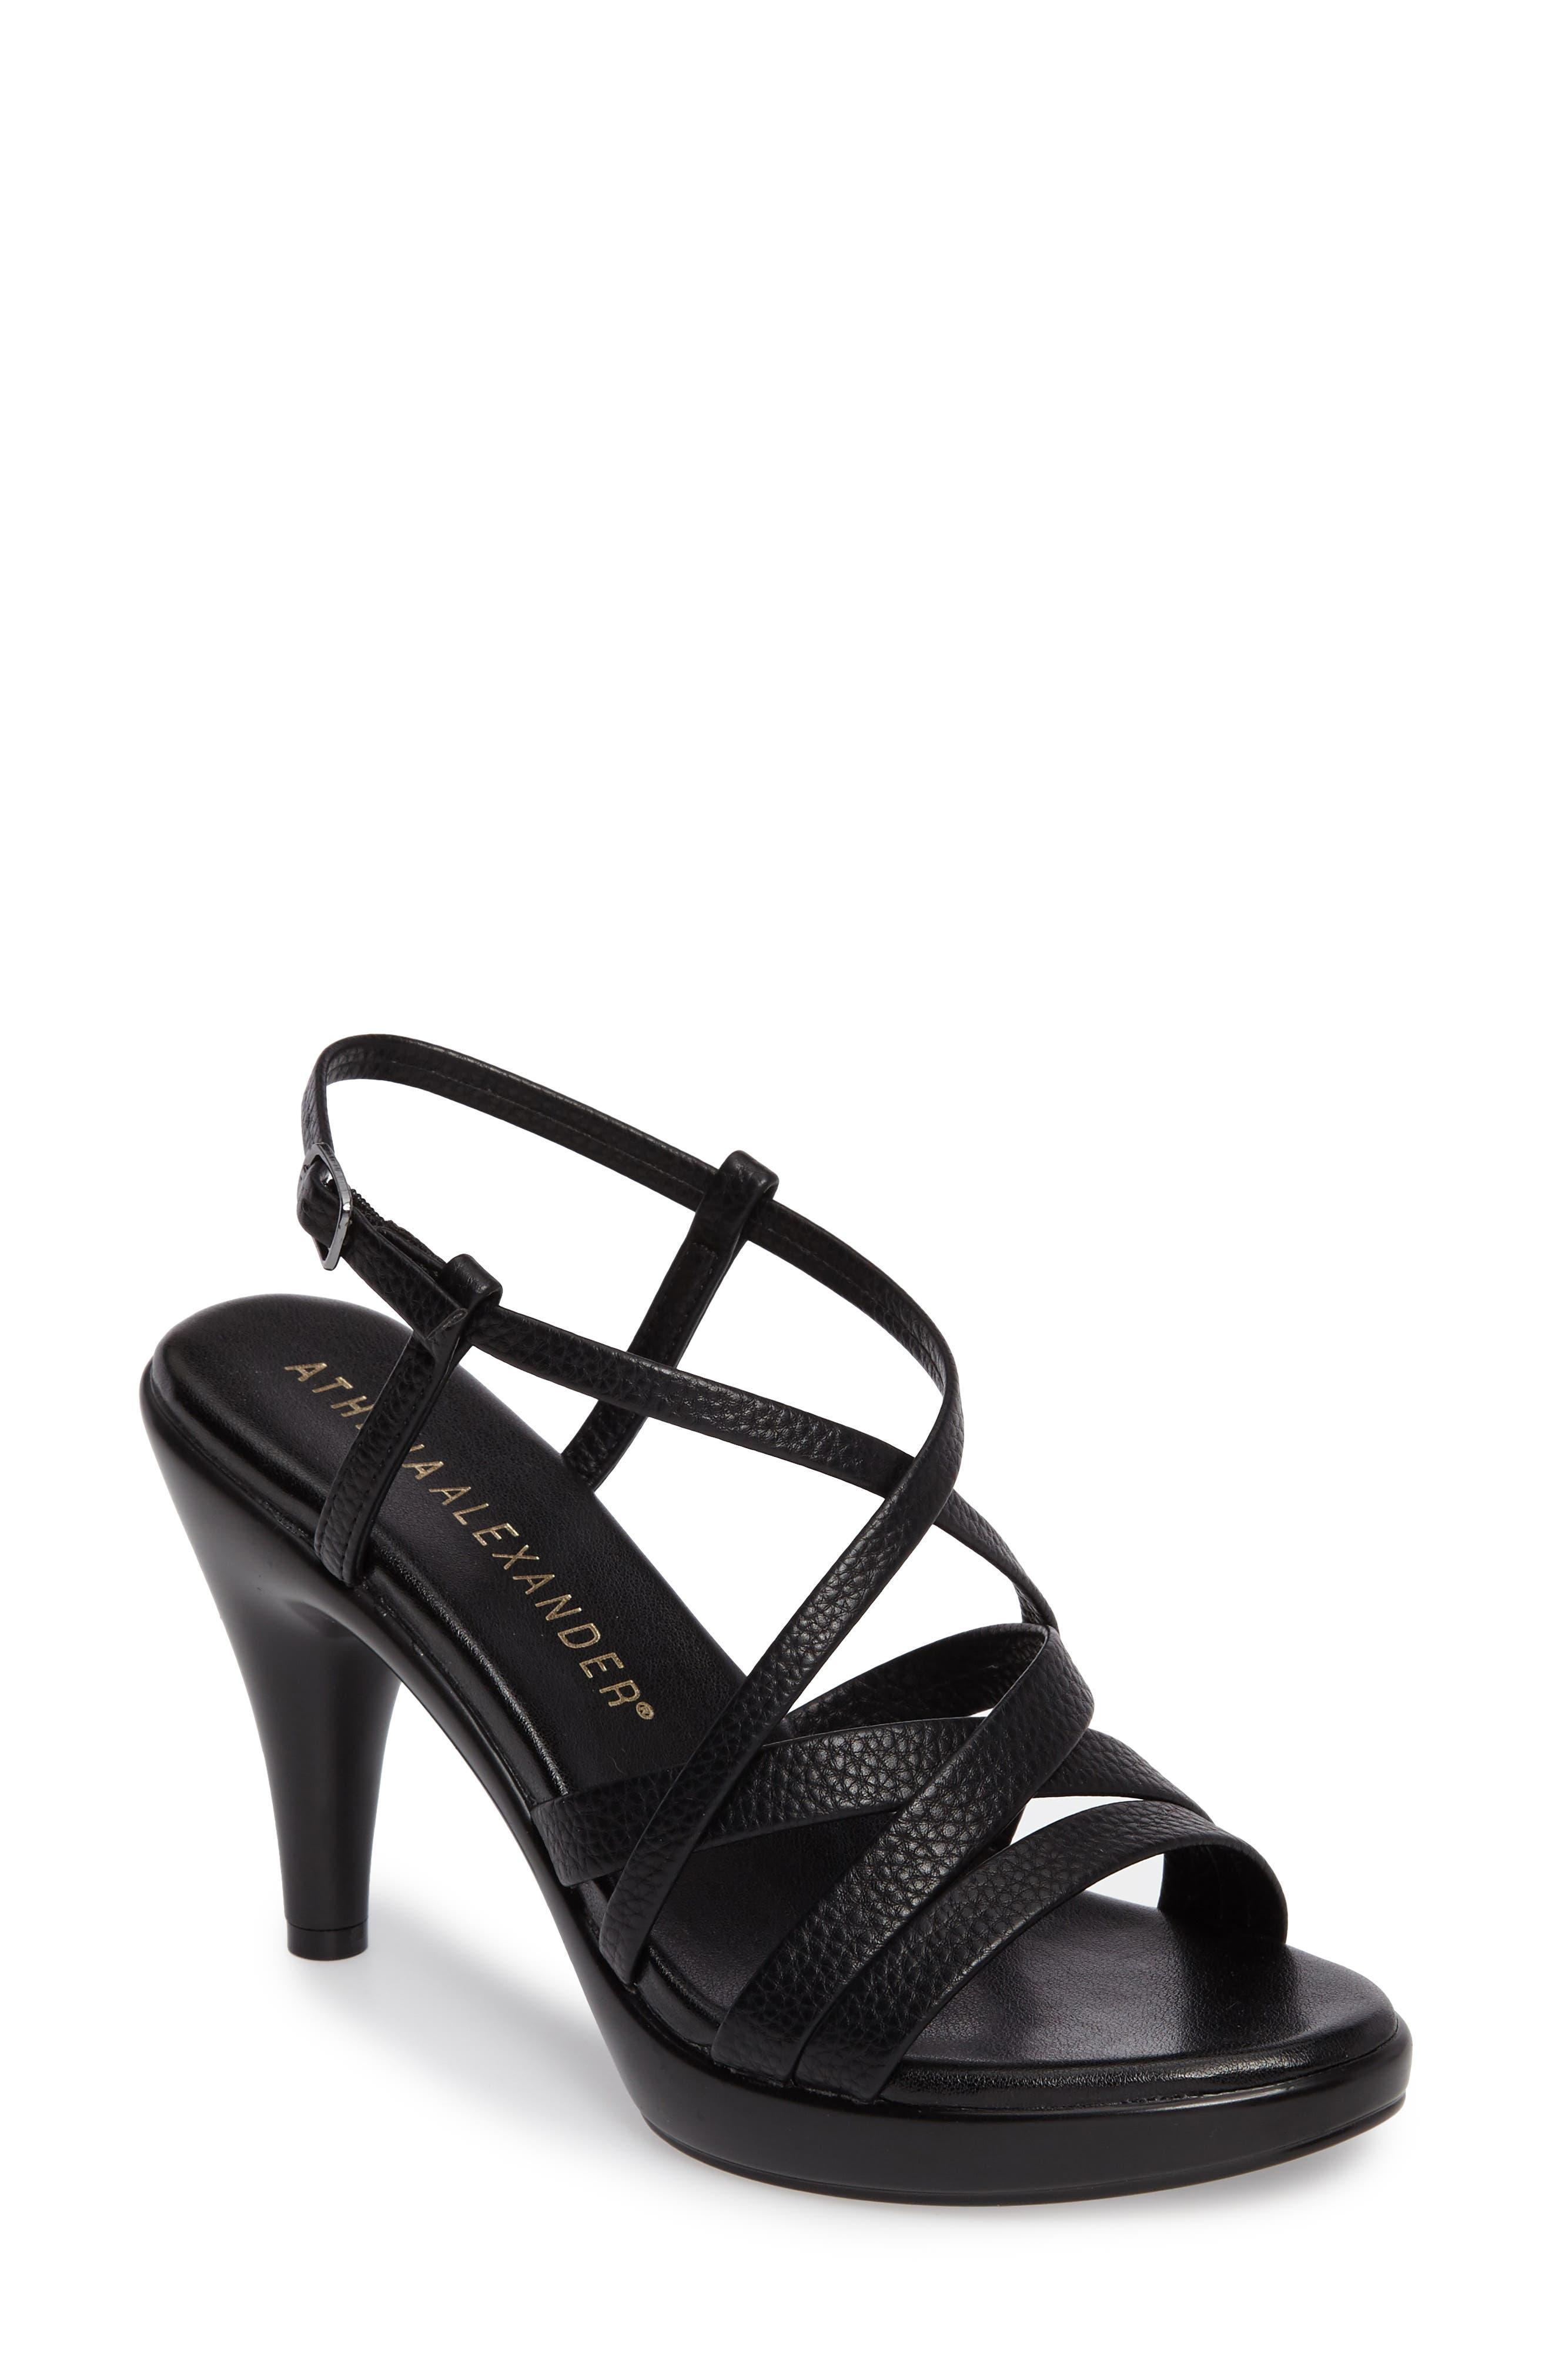 Main Image - Athena Alexander Gabrielaa Cross Strap Sandal (Women)